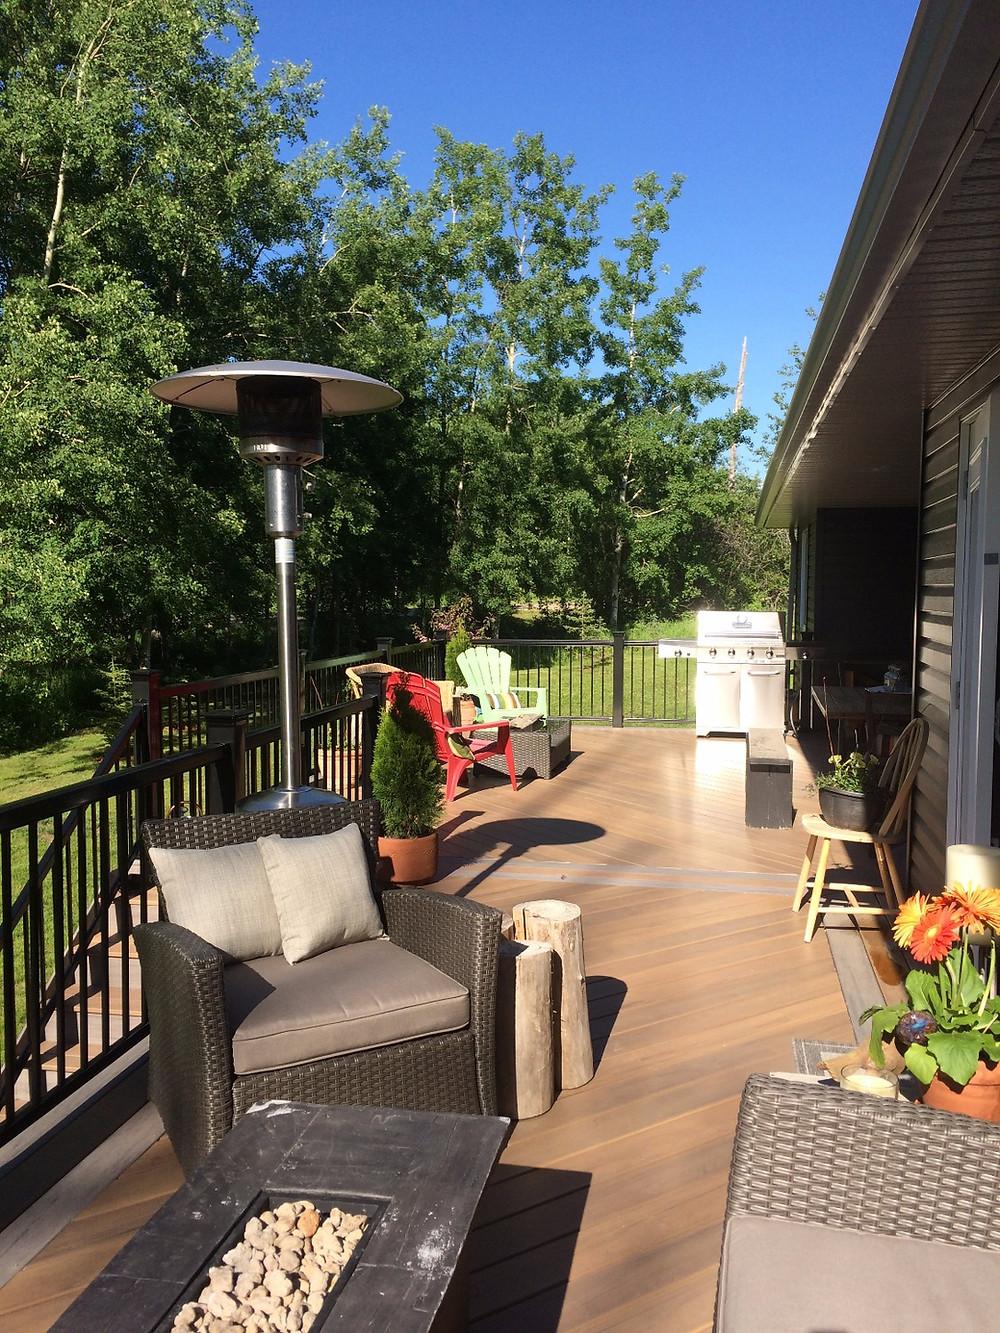 Summer patio furniture